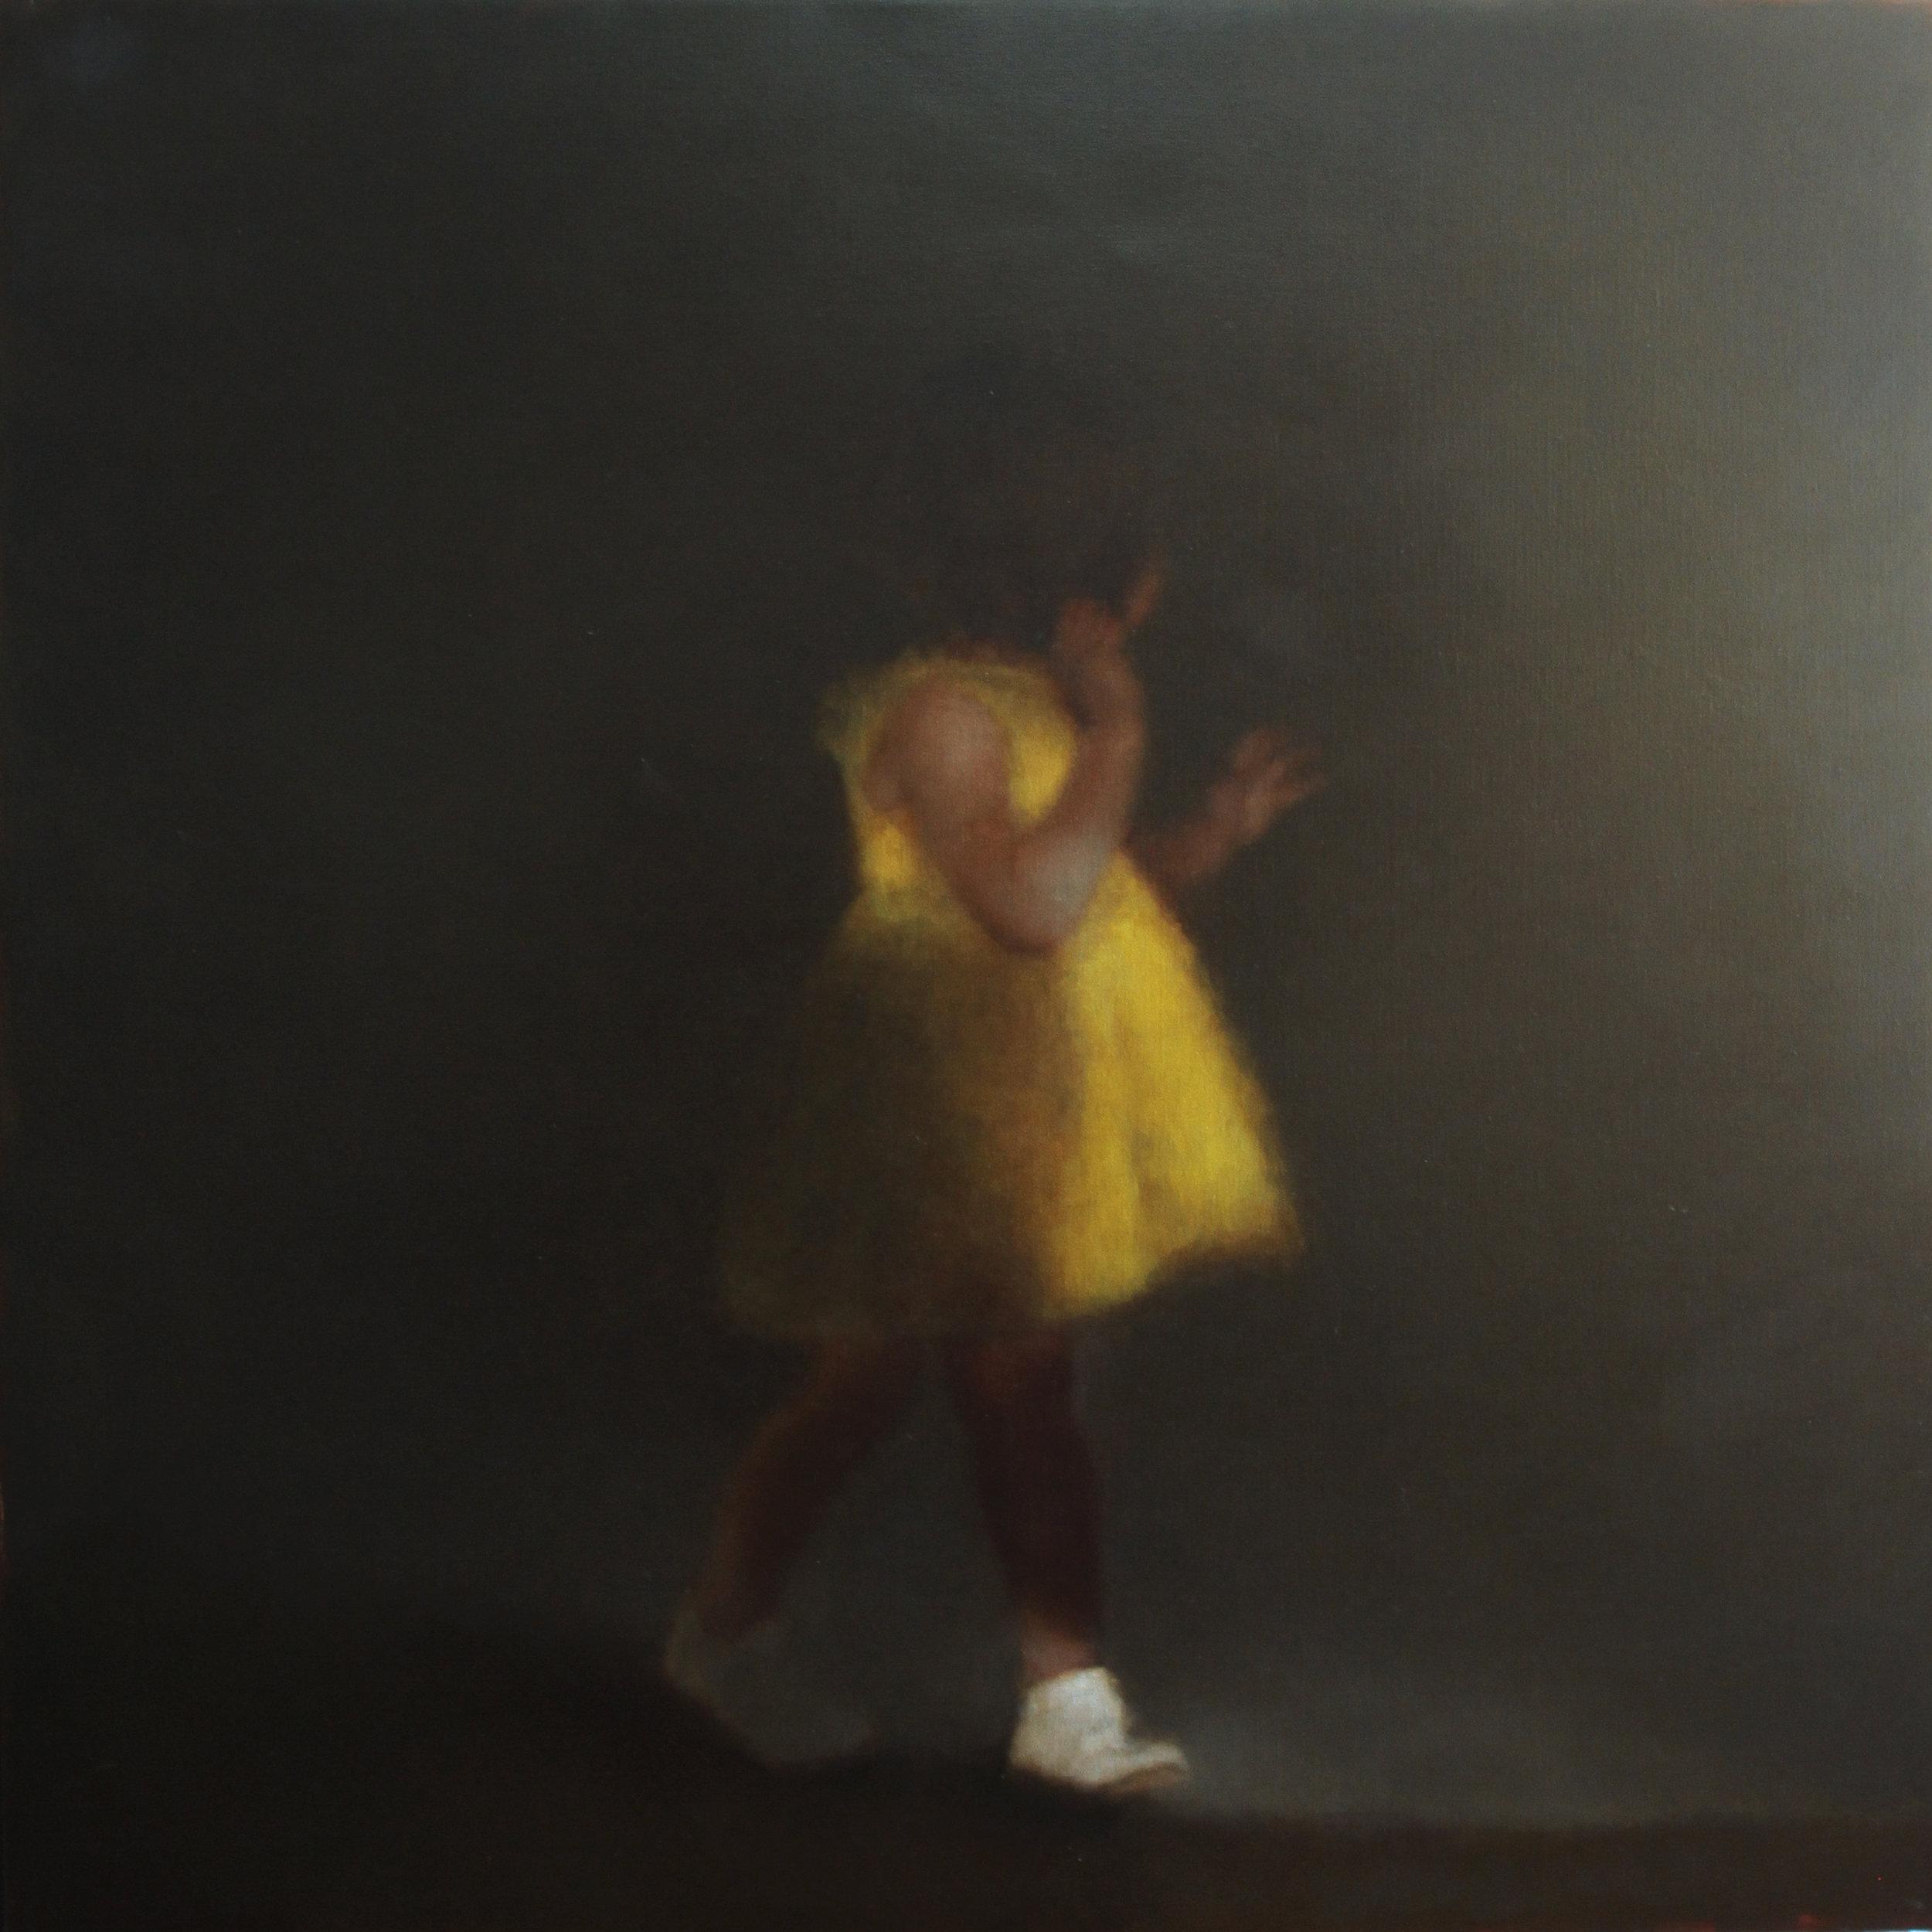 La robe jaune (2017) huile sur toile 110 x 110 cm